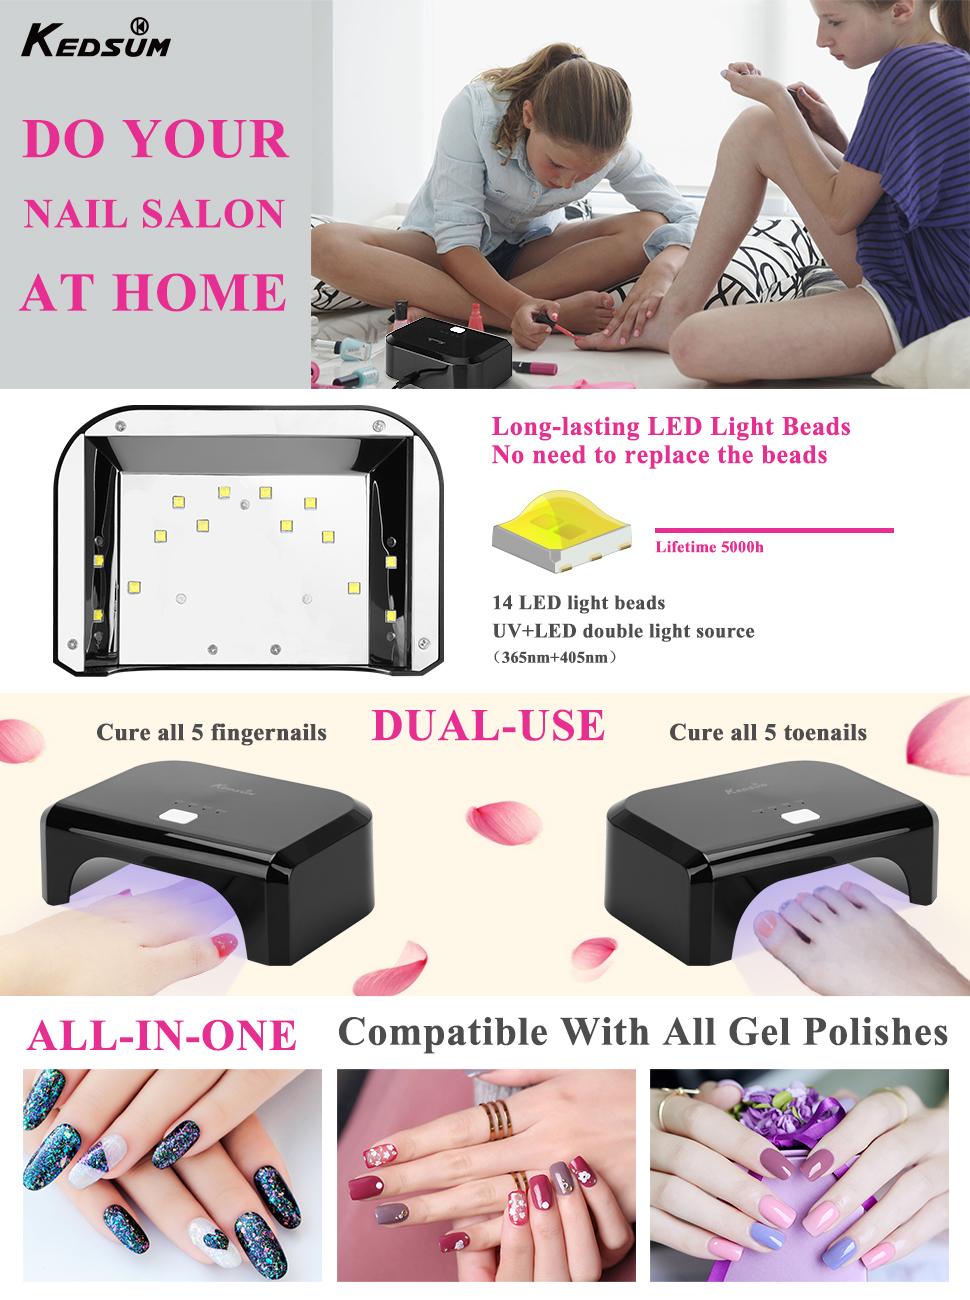 Amazon.com: KEDSUM 24W LED UV Nail Dryer Nail Lamp Curing Lamp for ...